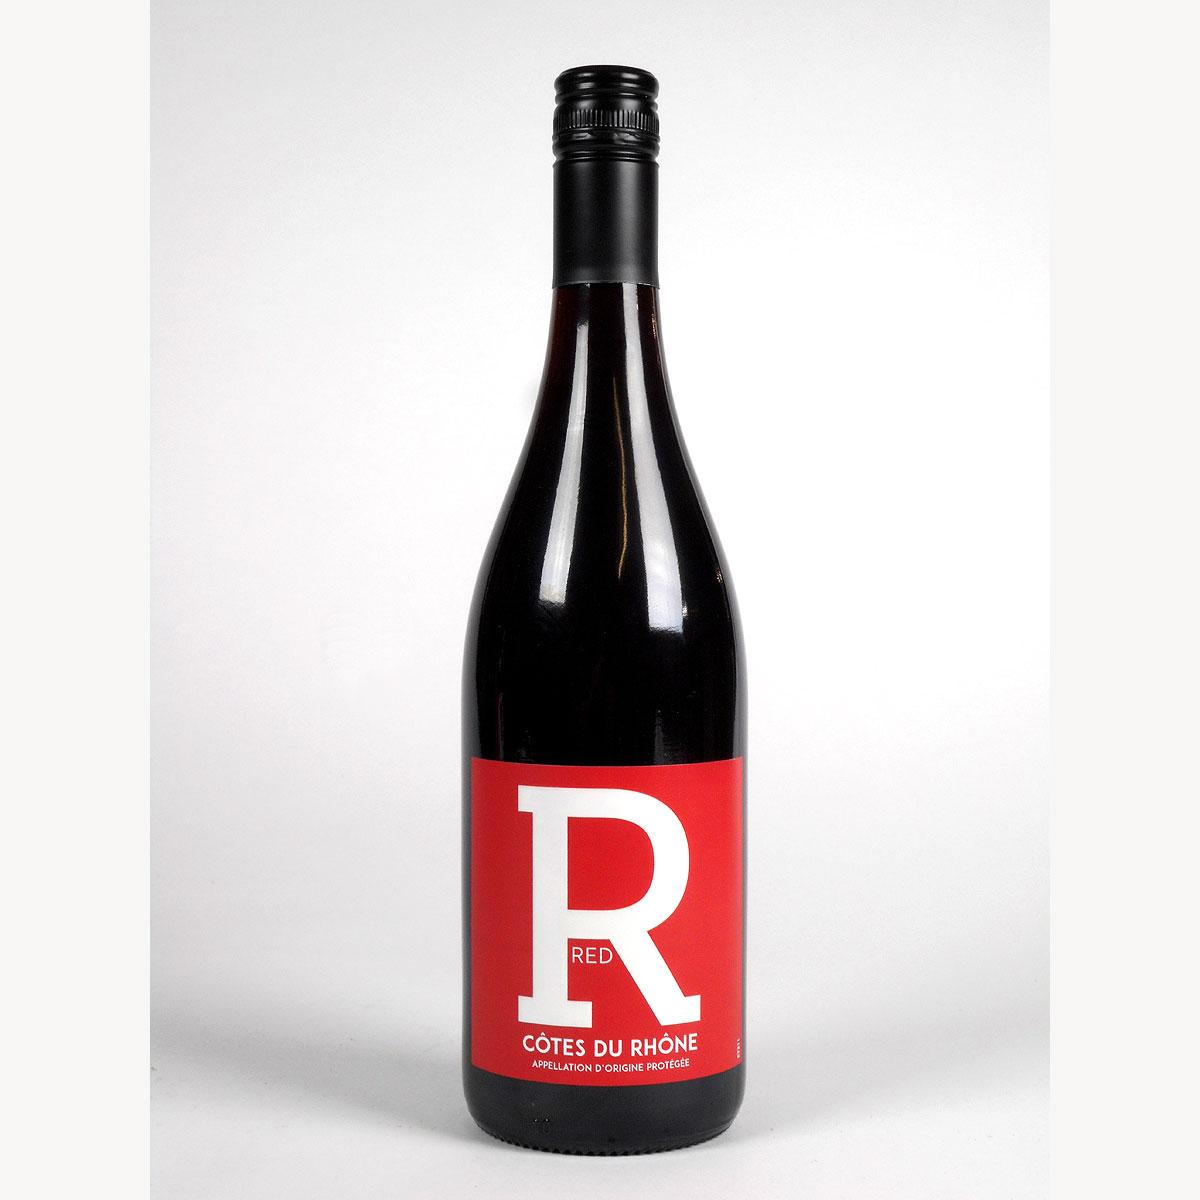 Yapp Côtes du Rhône Red 2019 - Bottle